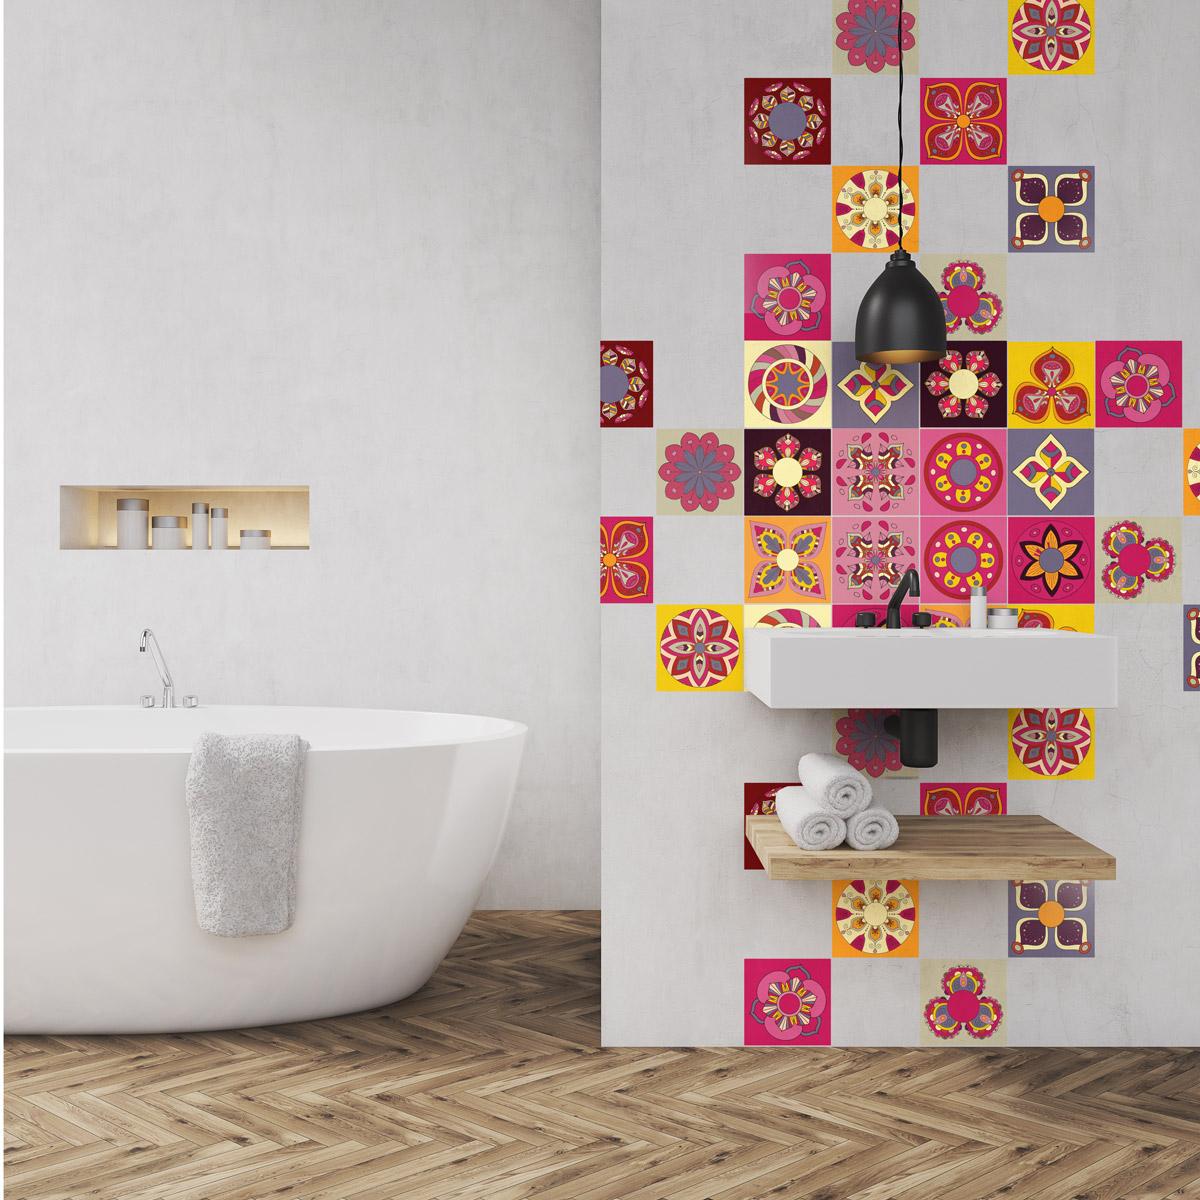 24 stickers carrelages azulejos porto alegre cuisine carrelages ambiance sticker. Black Bedroom Furniture Sets. Home Design Ideas